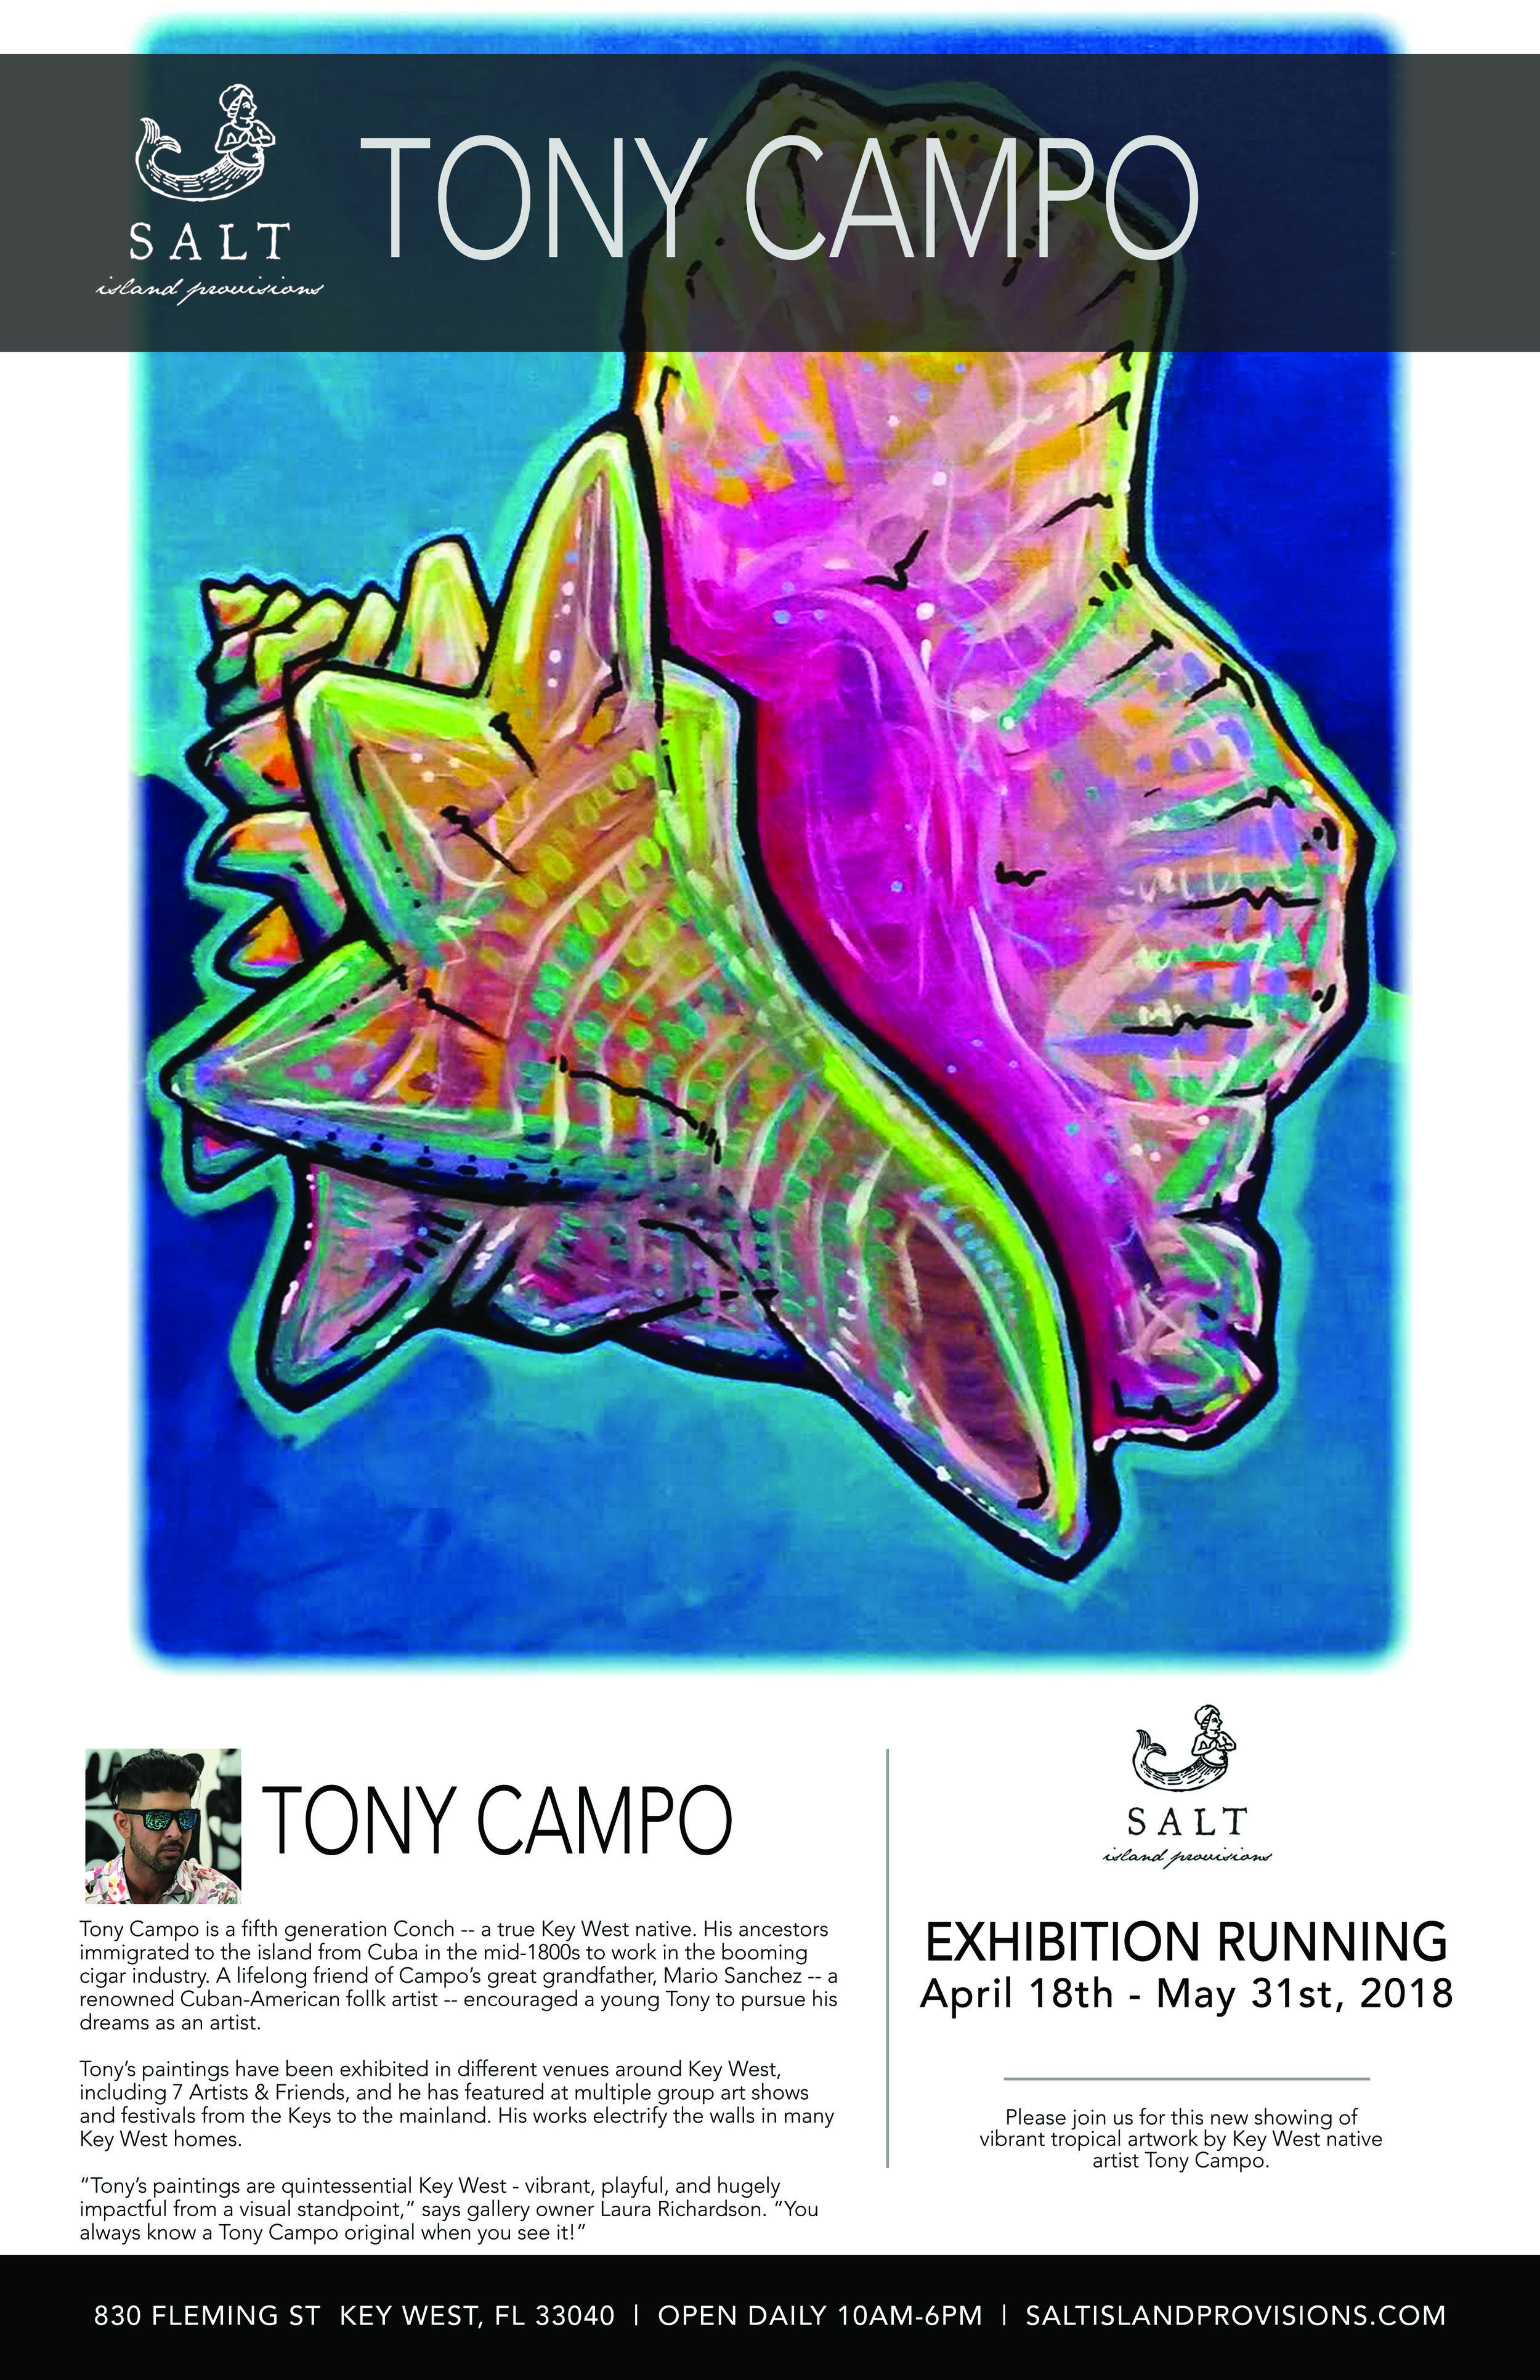 SALT_TonyCampo_Poster_11x17_PRINT.jpg